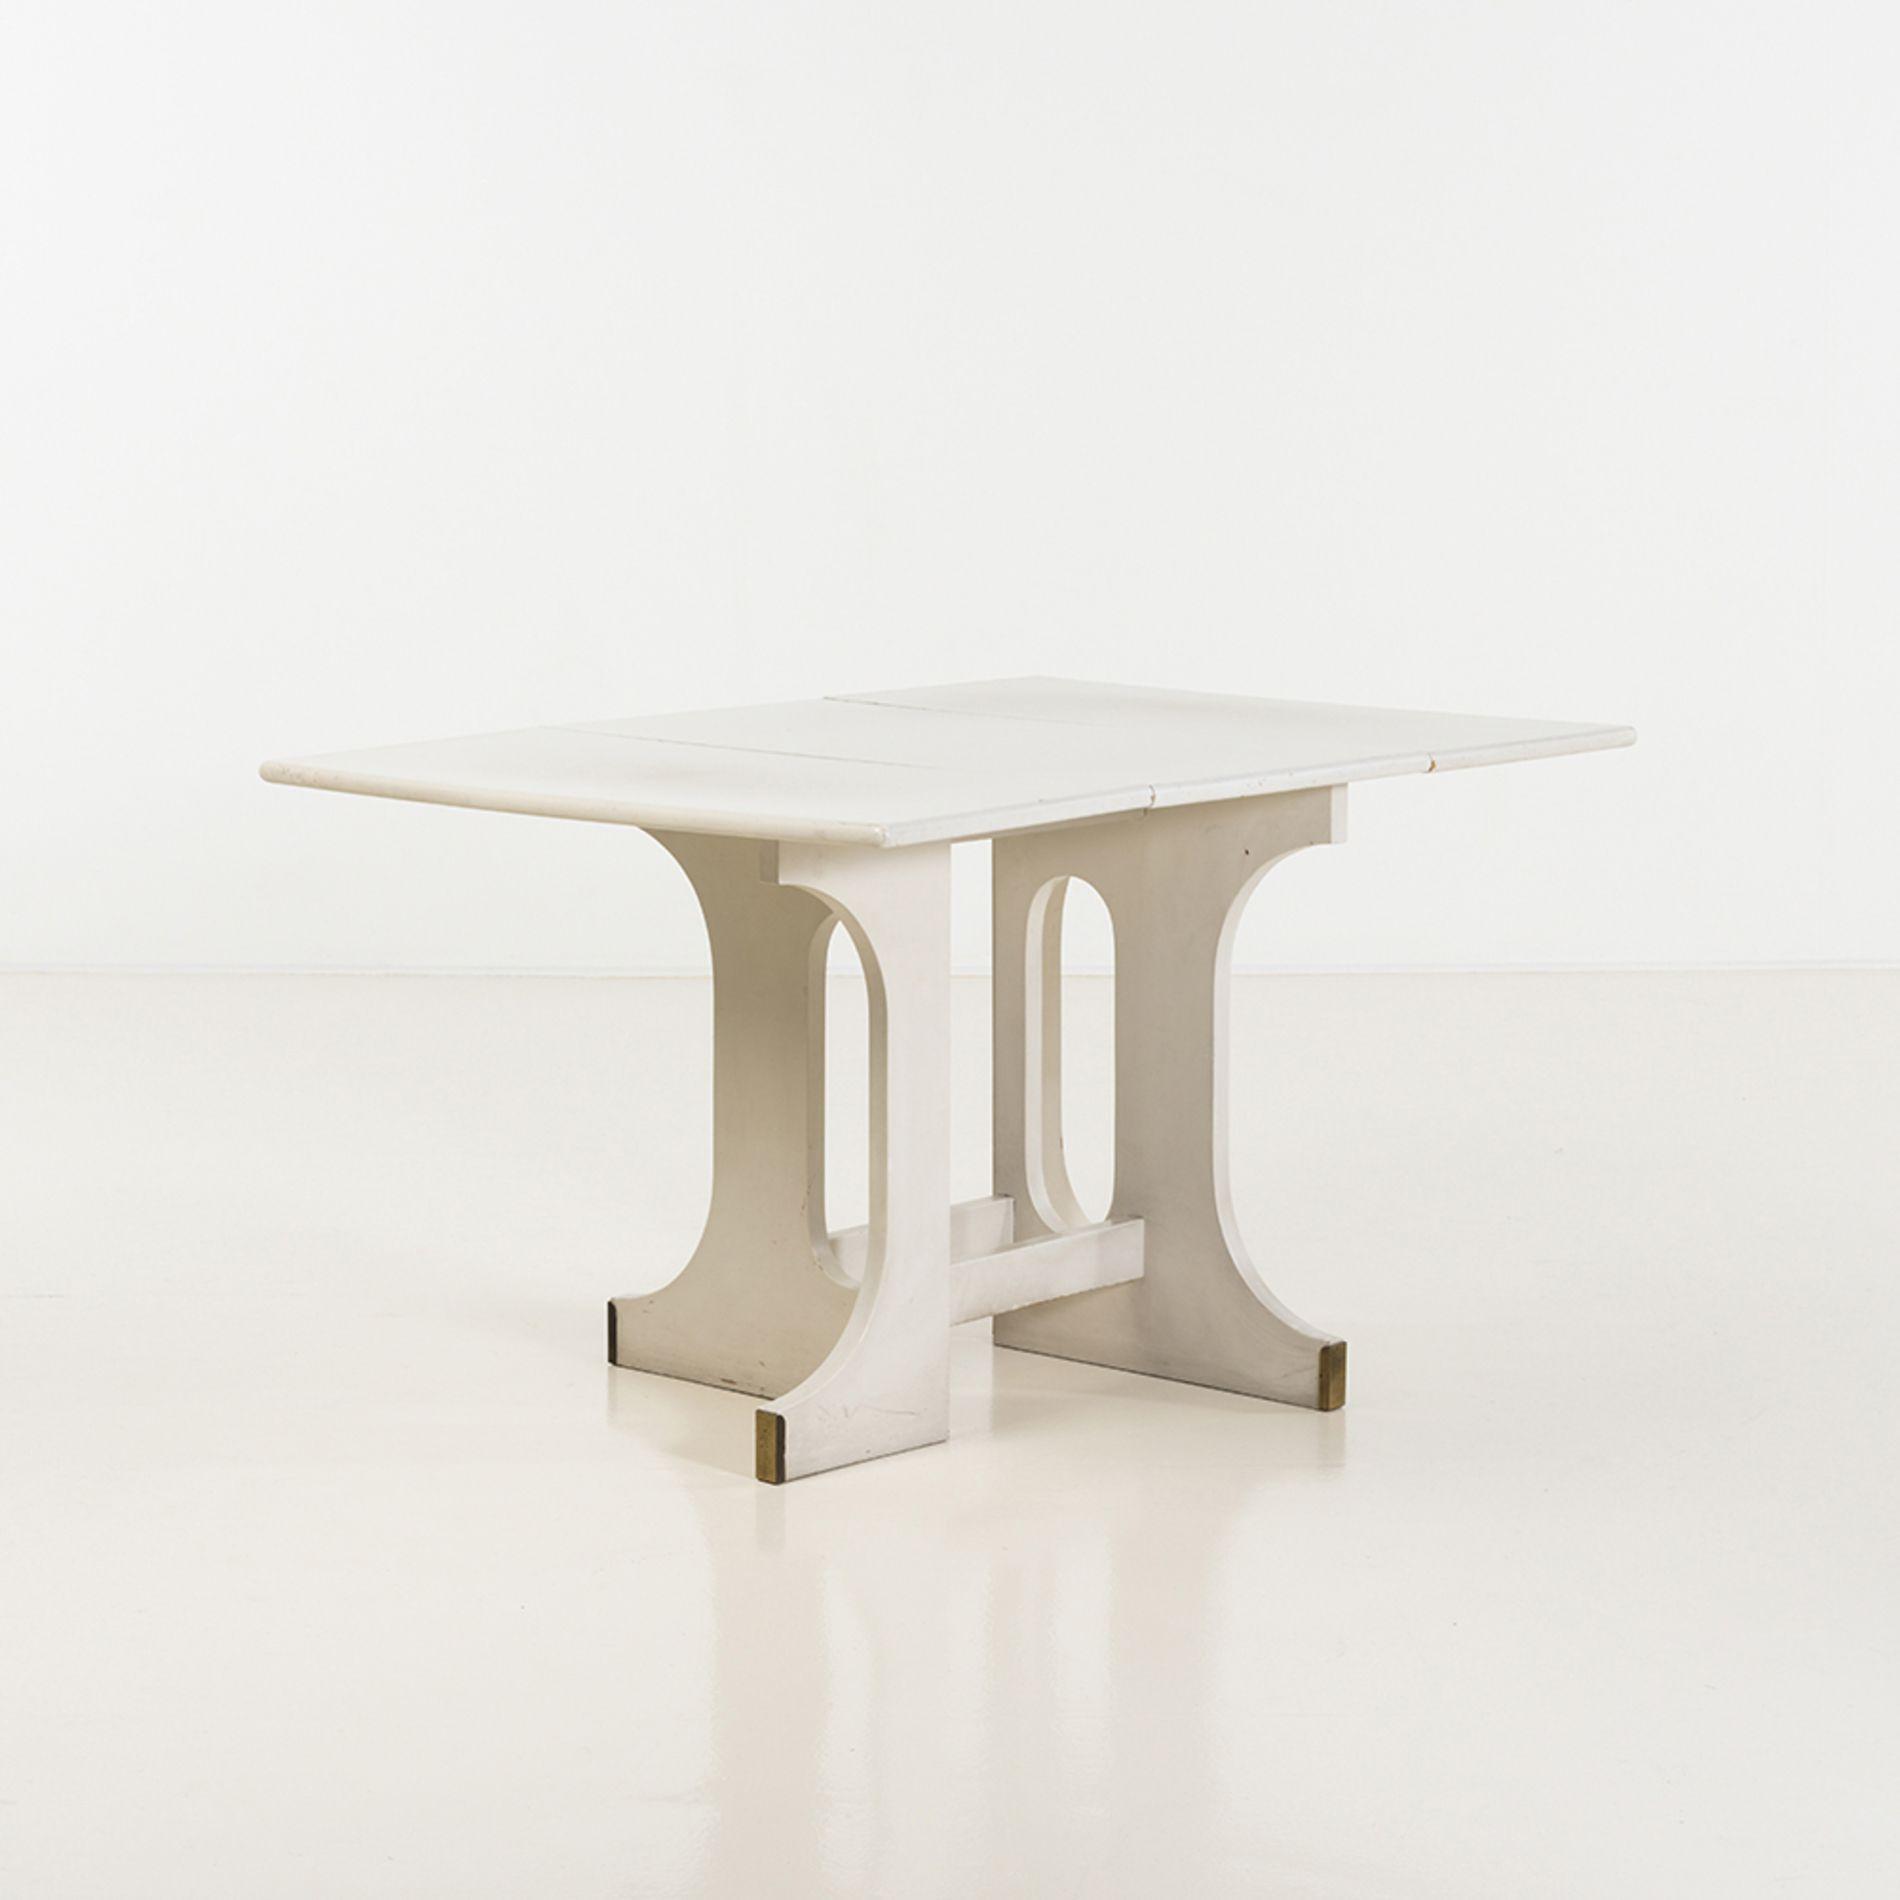 70154d56979a74e52a3bd3dc2f06a19d Incroyable De Table Basse Le Corbusier Concept